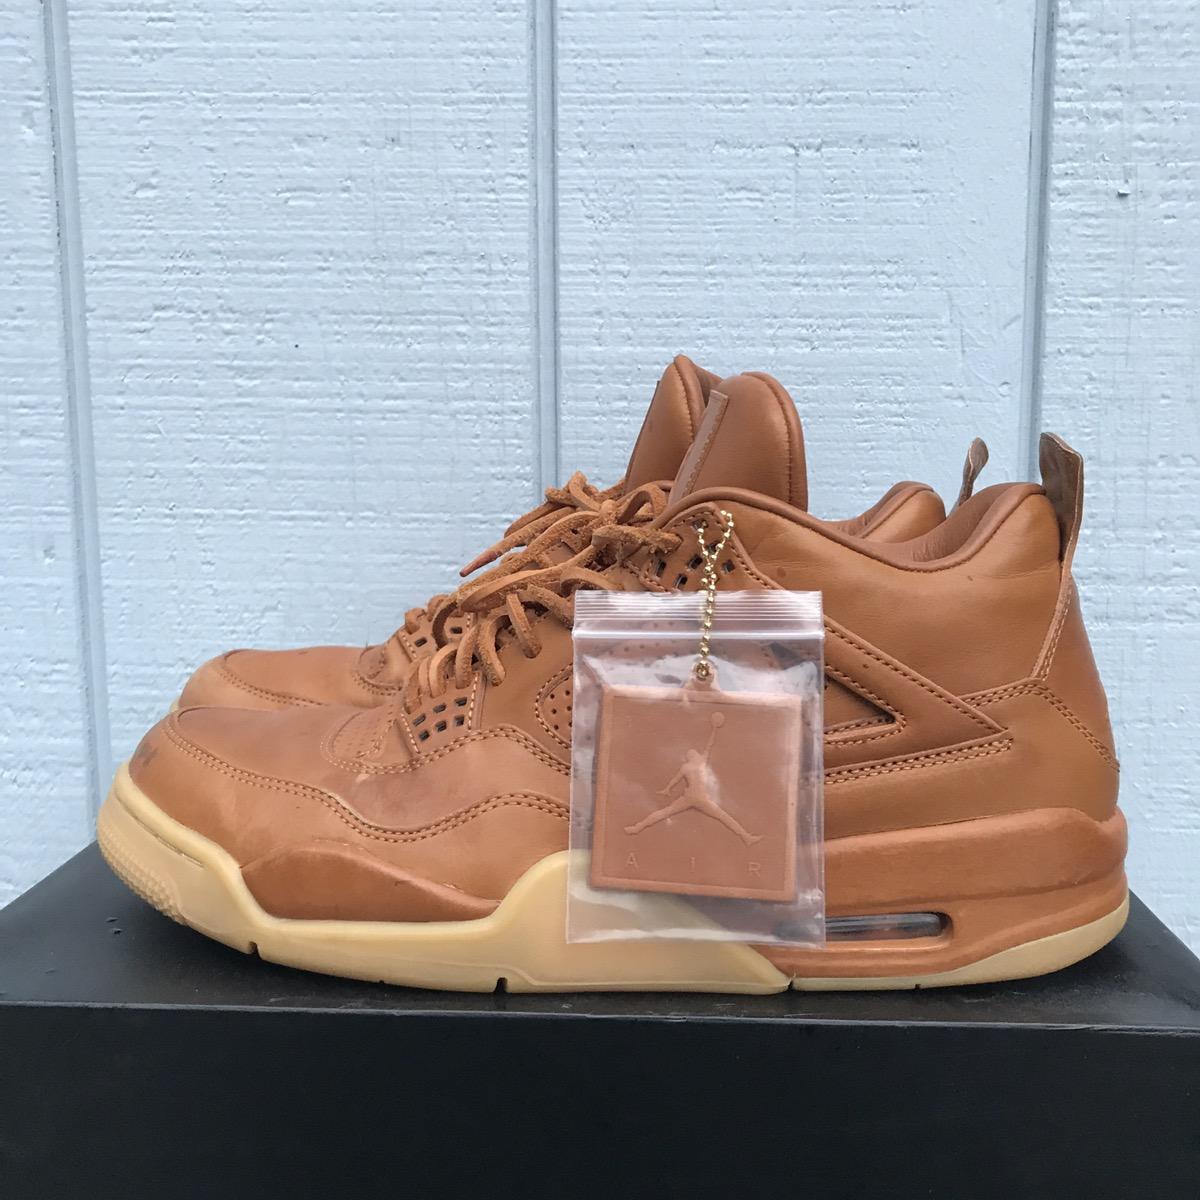 sports shoes 8c63c 2e309 Jordan Brand Nike Air Jordan 4 IV Retro Premium Wheat Ginger Gum Pinnacle  Size 11 - Low-Top Sneakers for Sale - Grailed